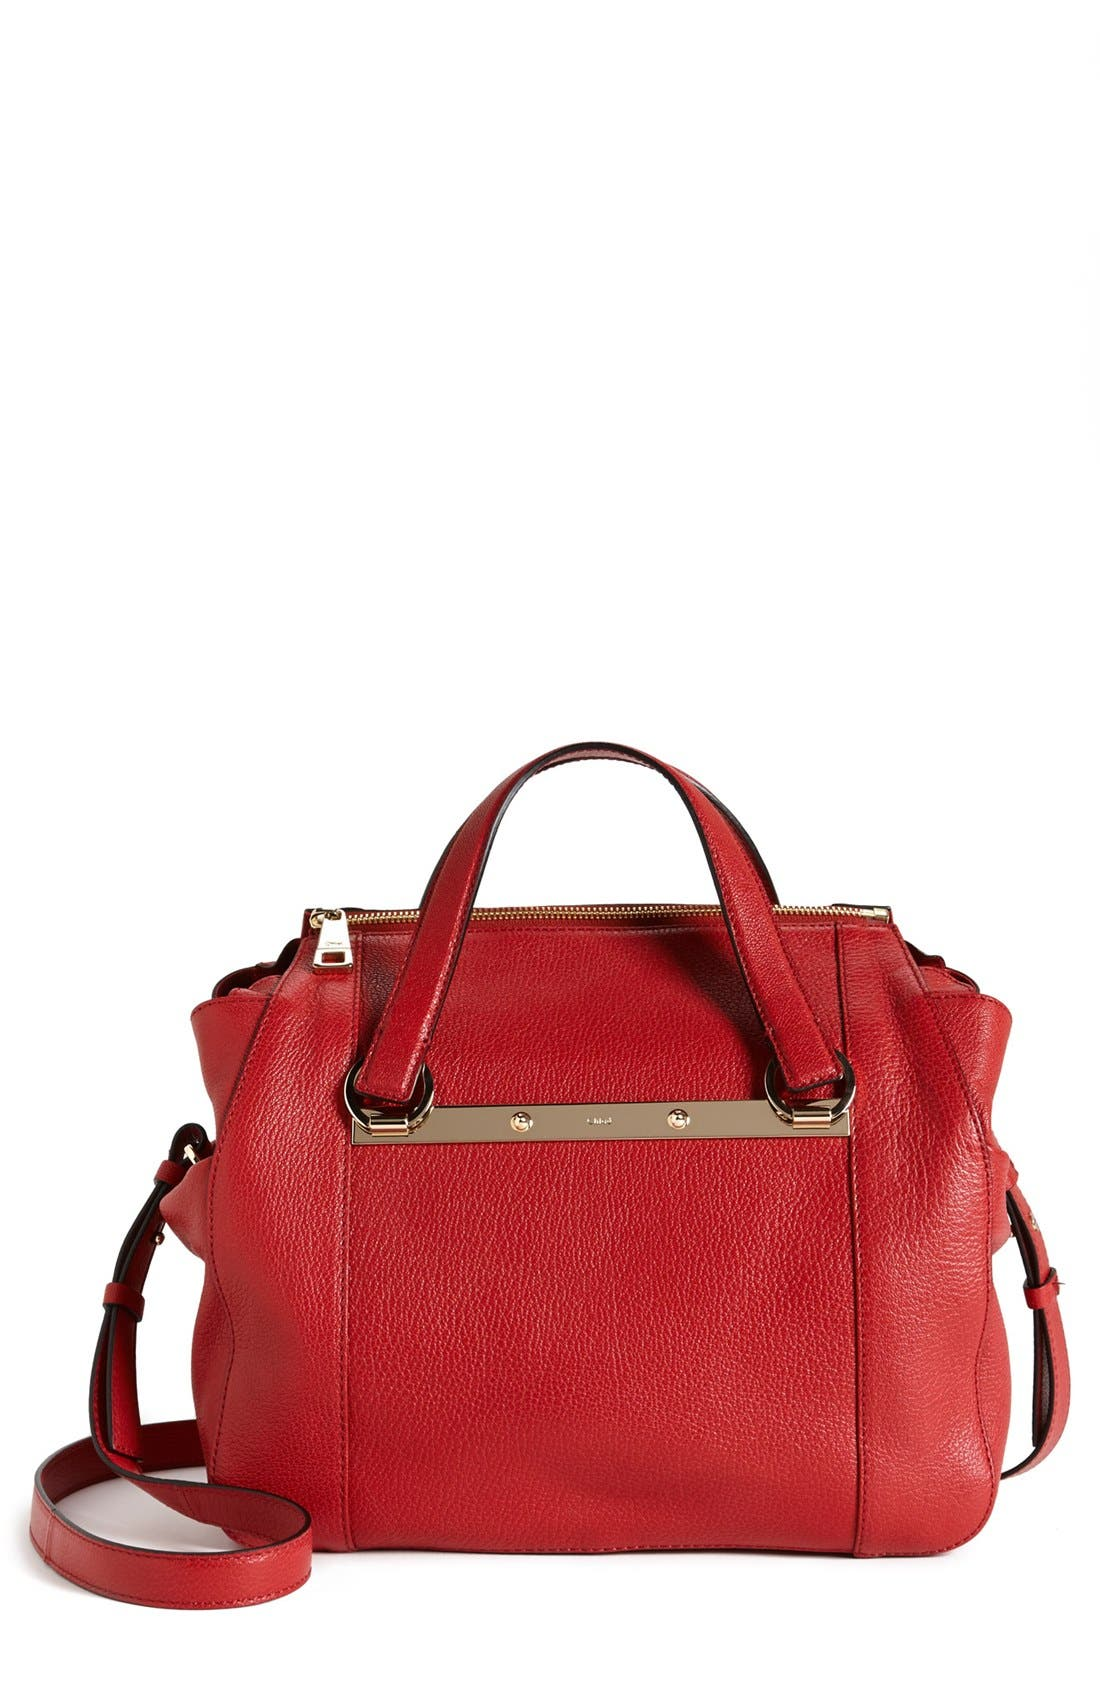 Alternate Image 1 Selected - Chloé 'Bridget - Small' Shoulder Bag